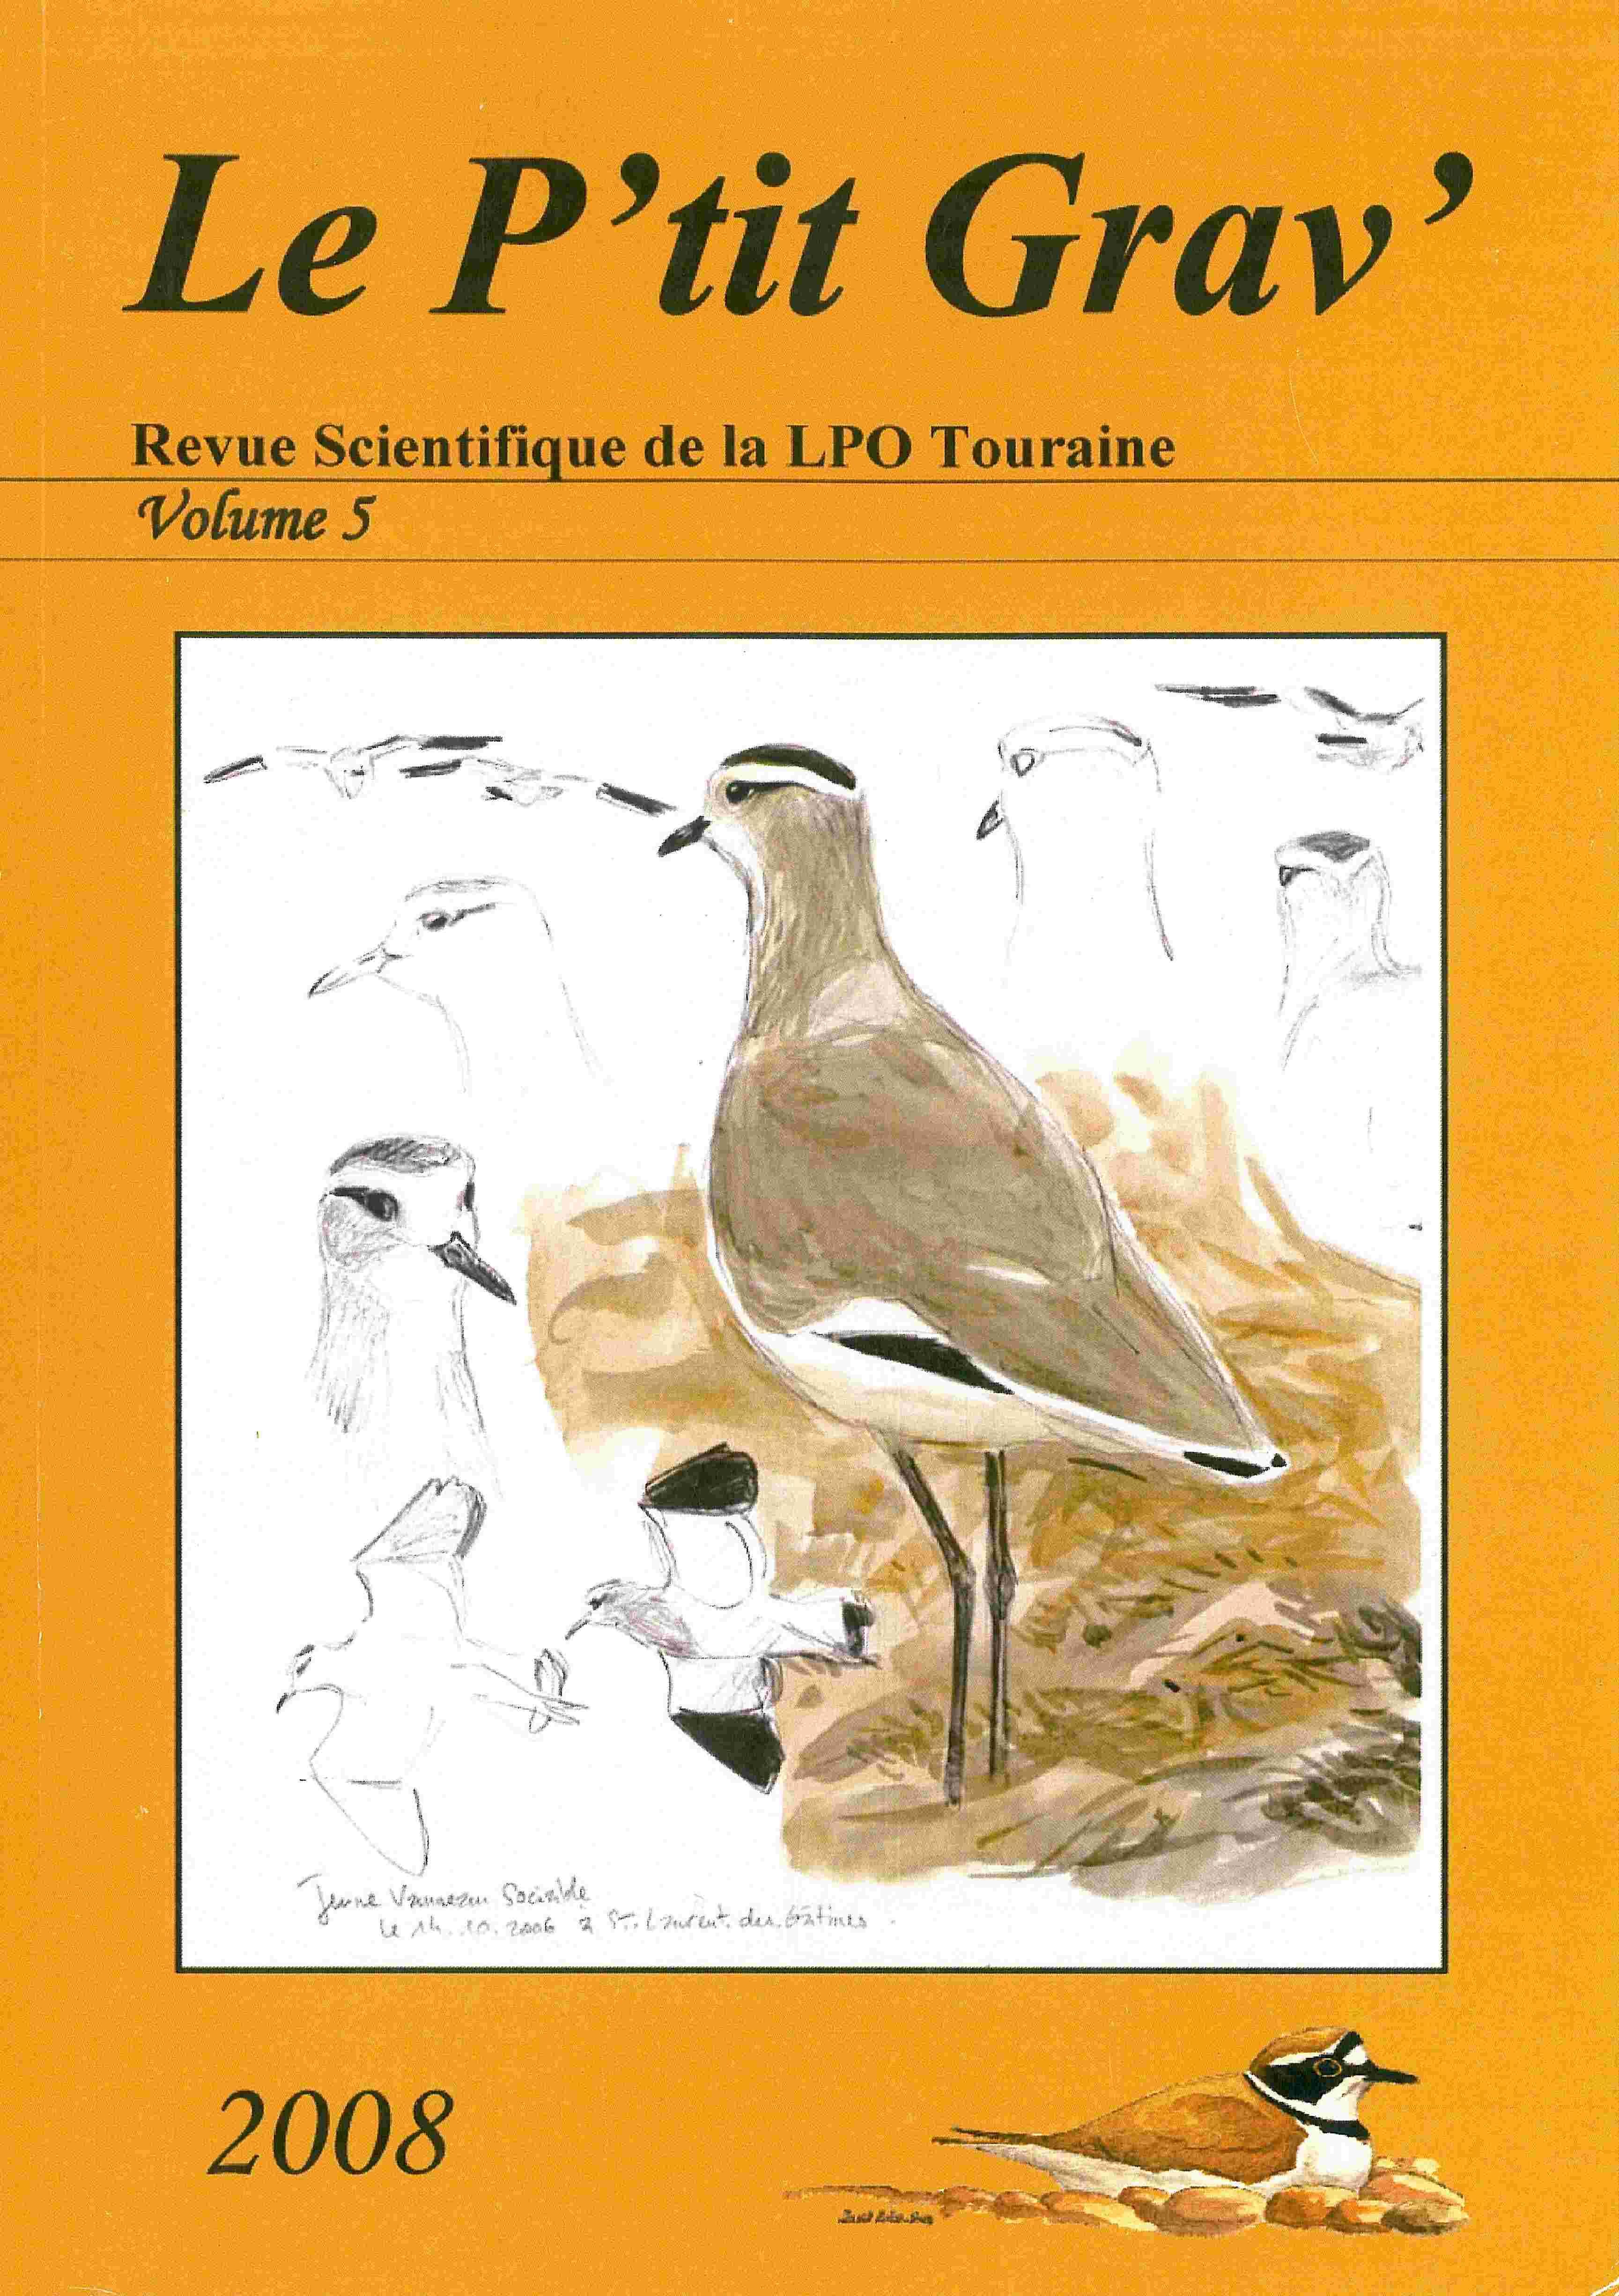 https://cdnfiles1.biolovision.net/www.faune-touraine.org/userfiles/MonDossier/PtitGravvol5.jpg